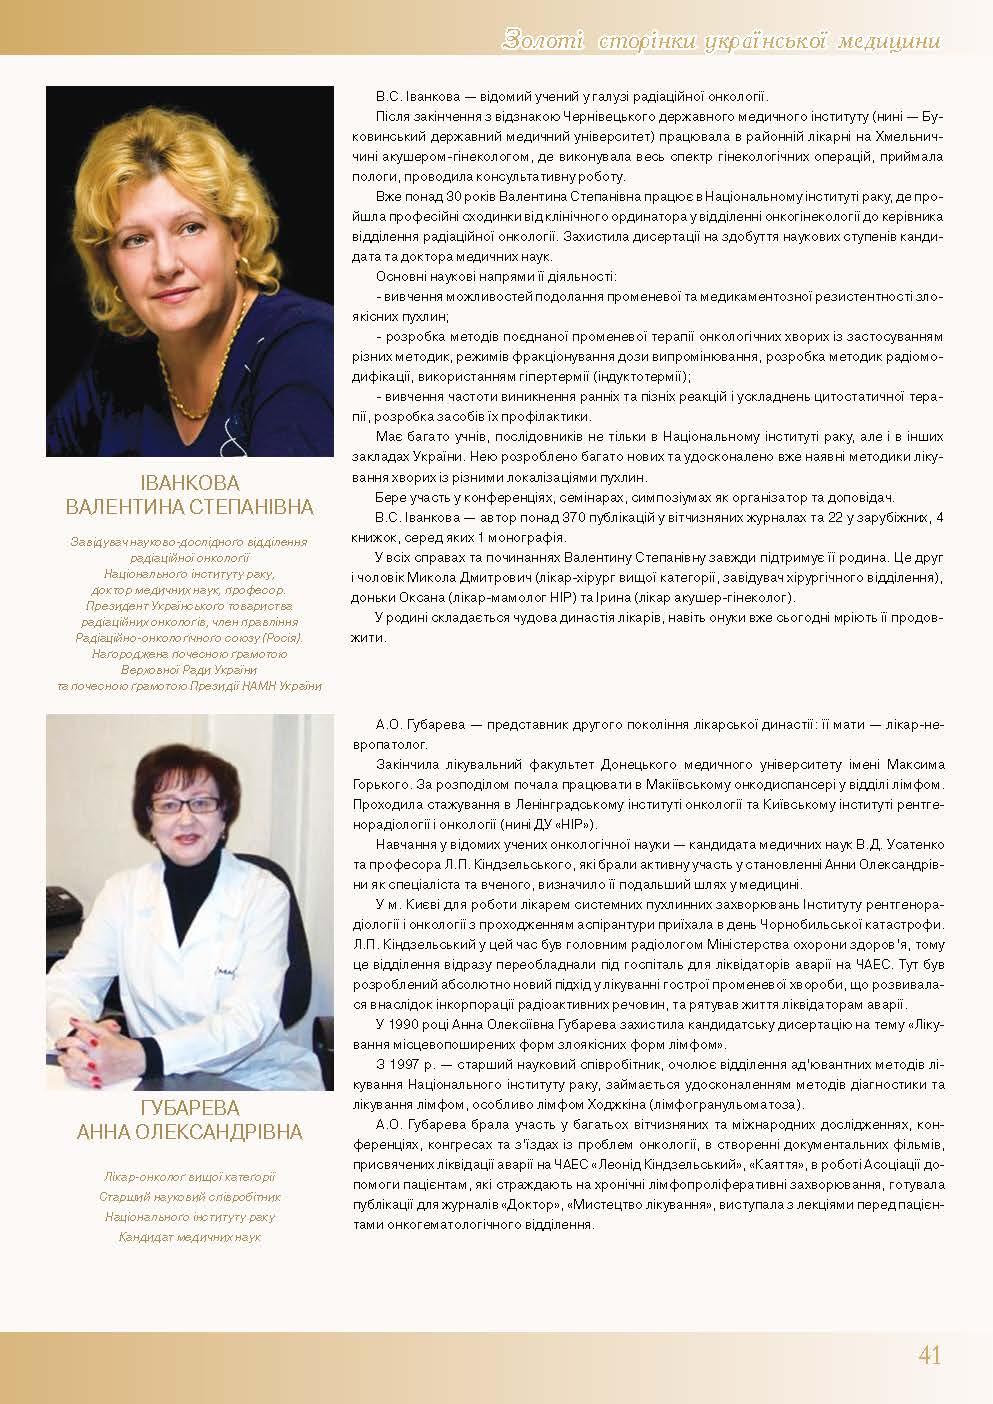 Іванкова Валентина Степанівна, Губарева Анна Олександрівна